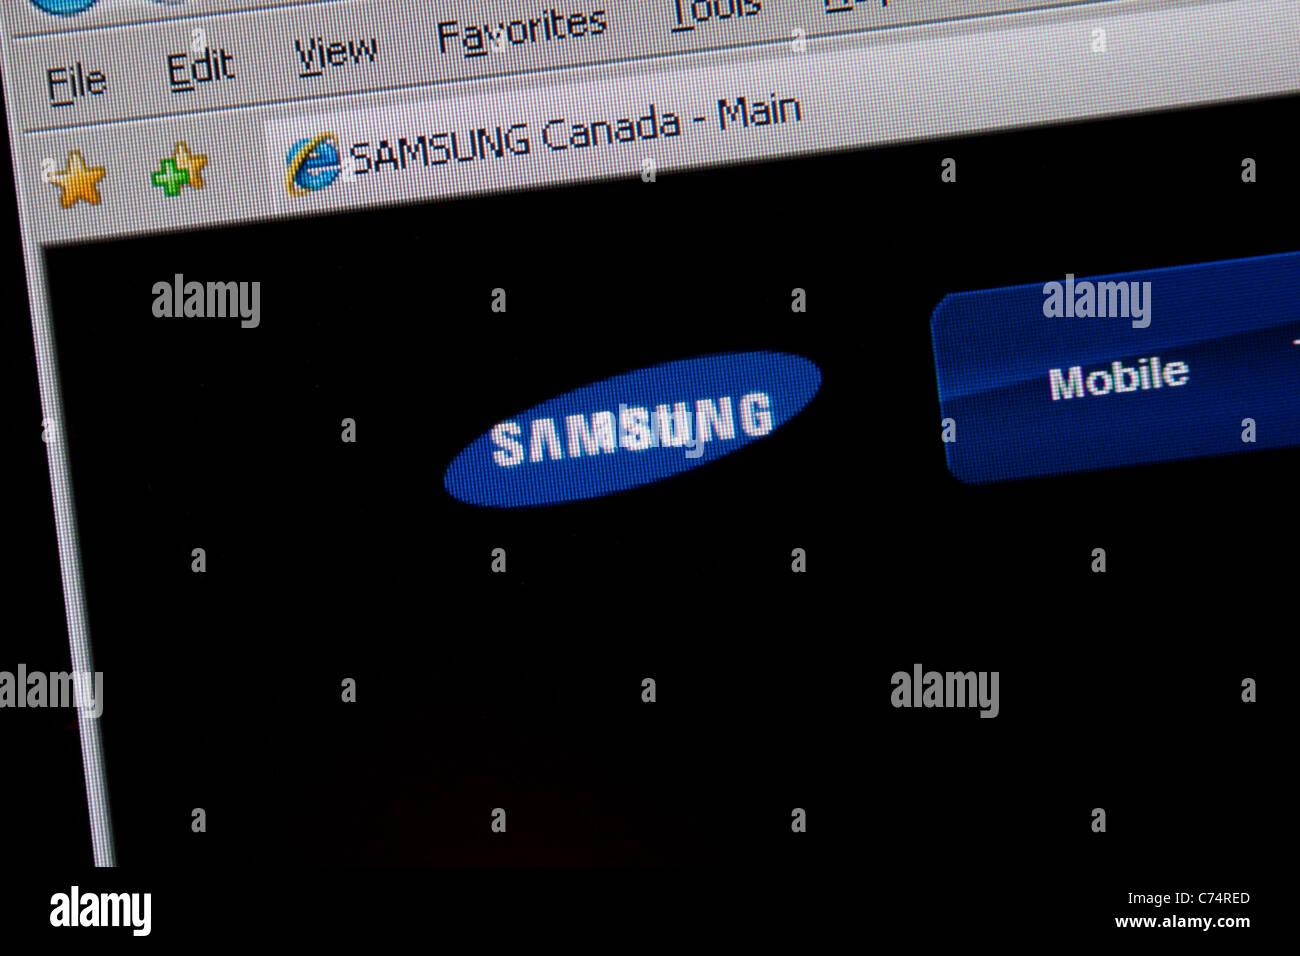 samsung logo website - Stock Image